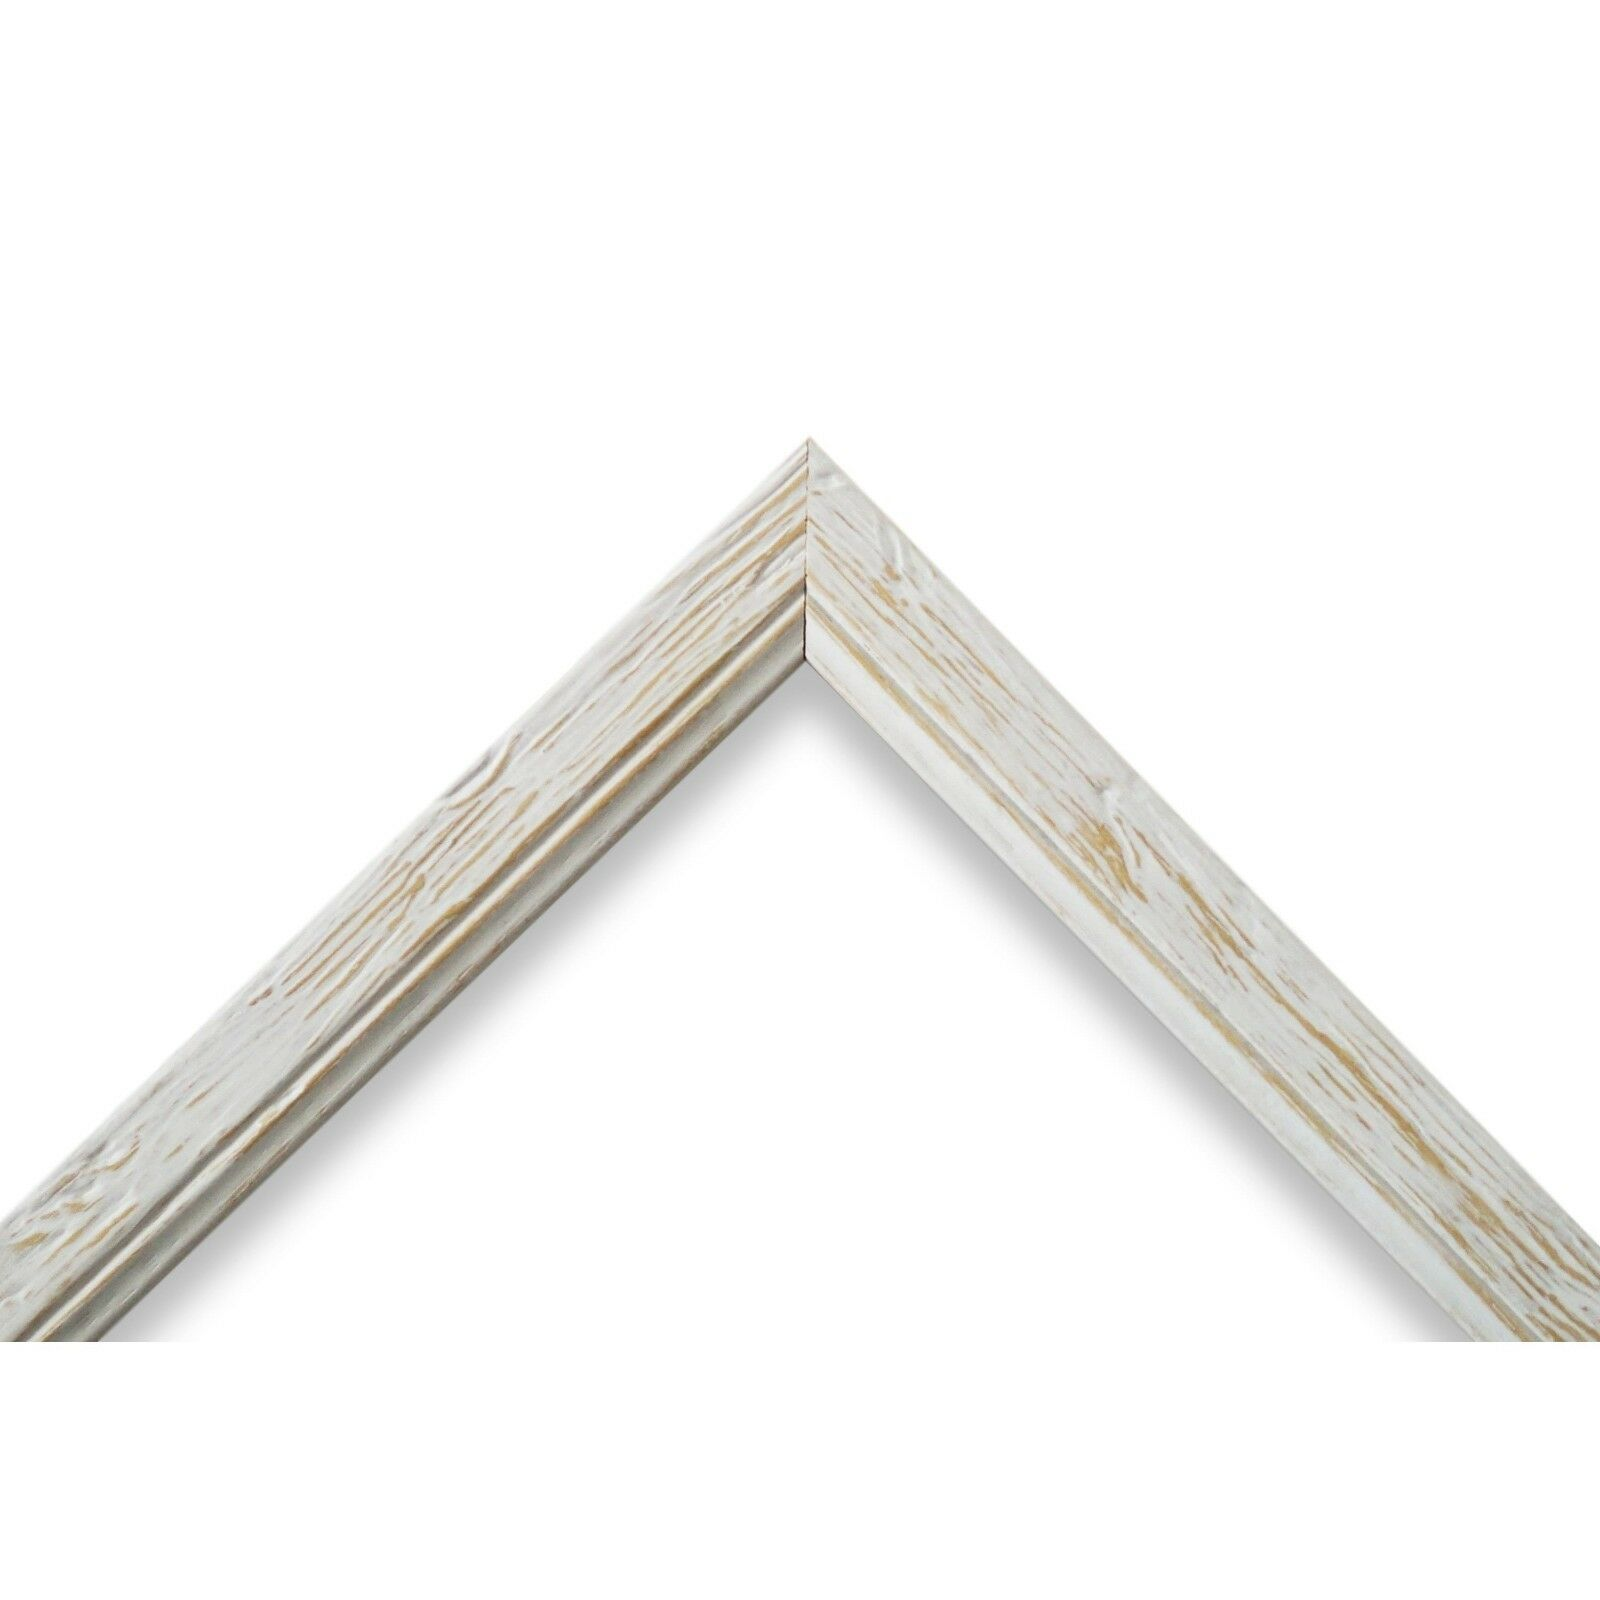 Bilderrahmen Kupfer Gold Vintage Holz Sanremo 1,8-40x60 50x50 50x60 60x60